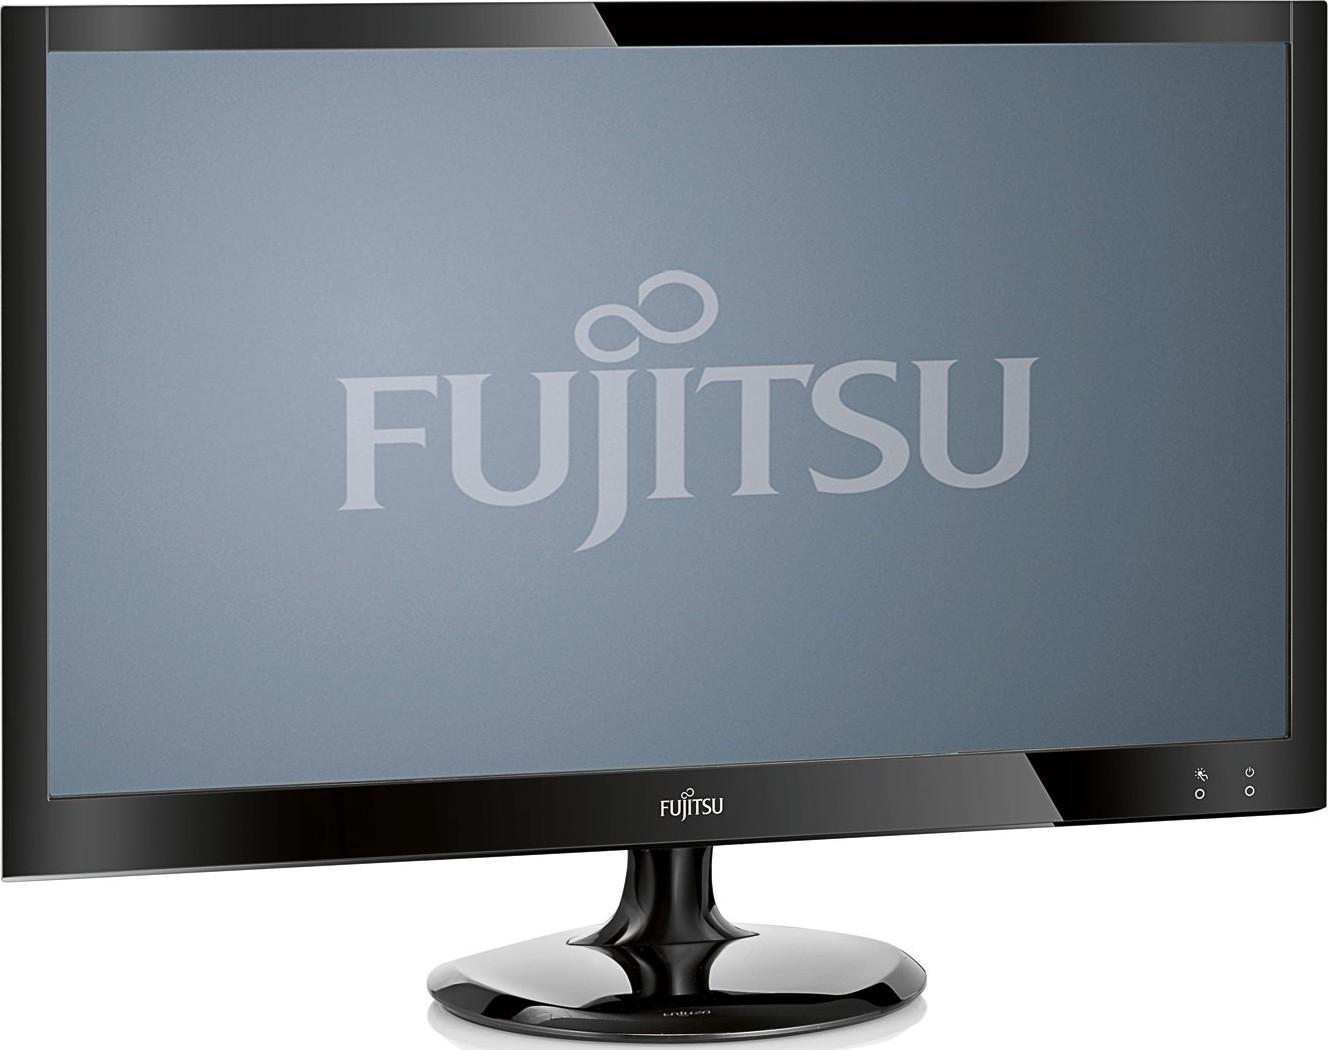 FUJITSU SL23T-1 DRIVERS FOR WINDOWS 10